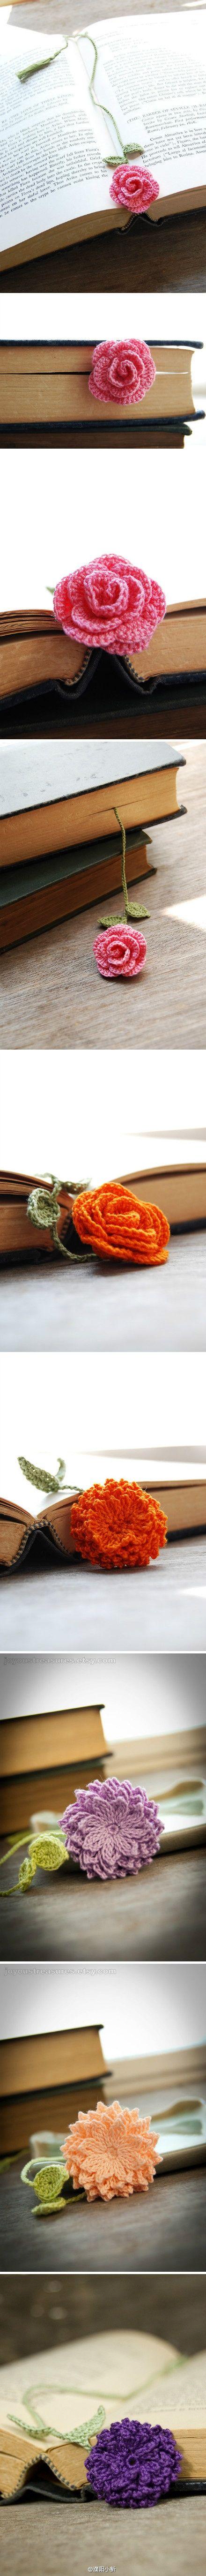 Pretty bookmarks - crochet flowers..